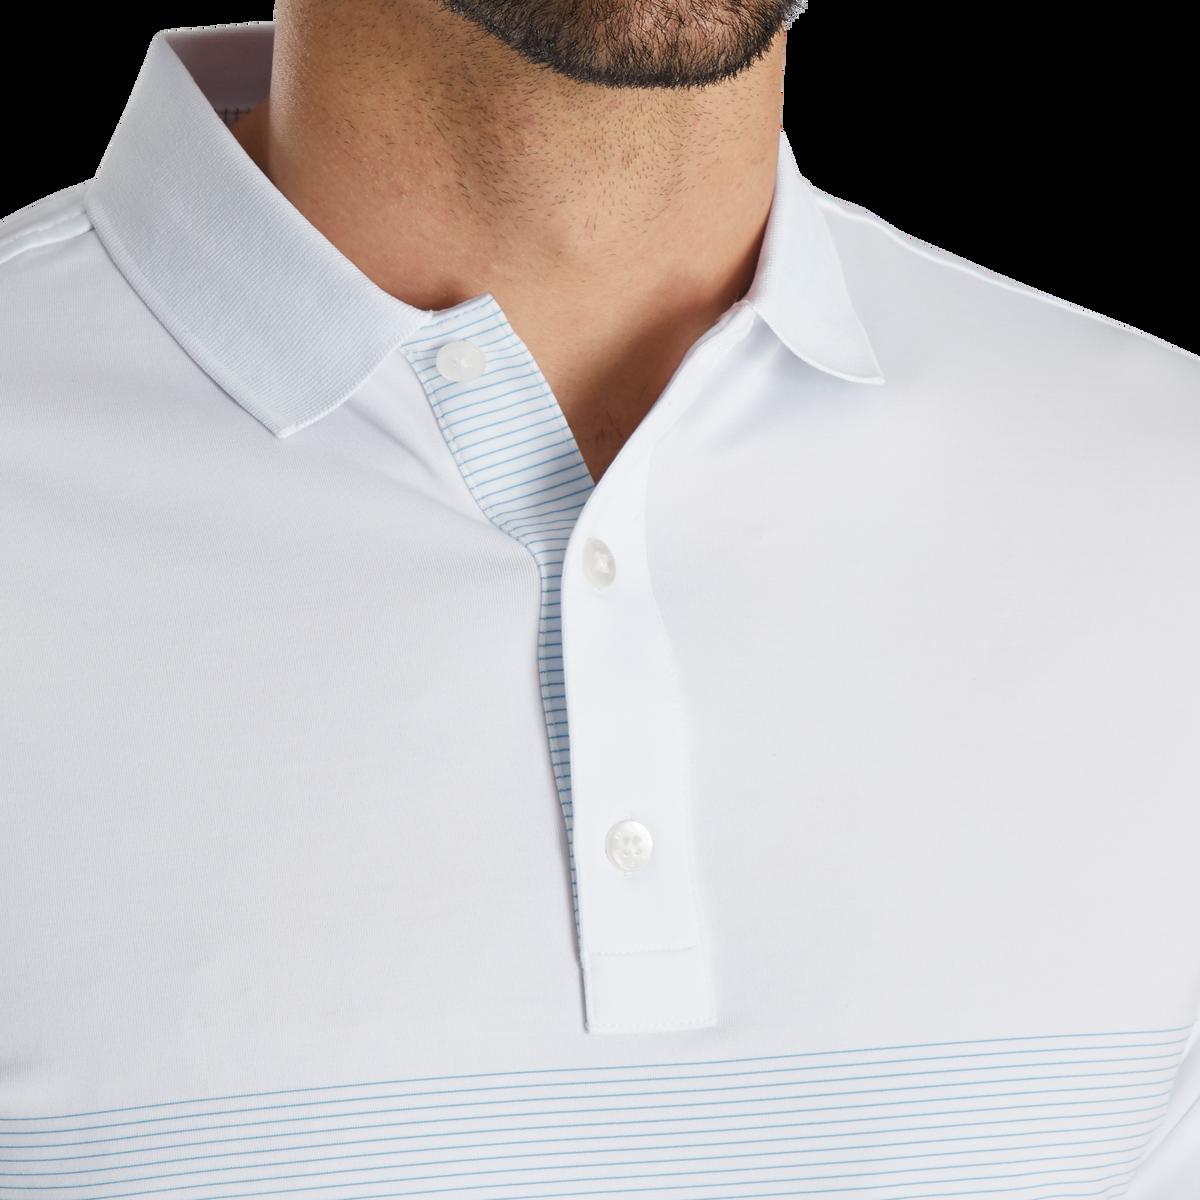 Lisle Engineered Pin Stripe Self Collar